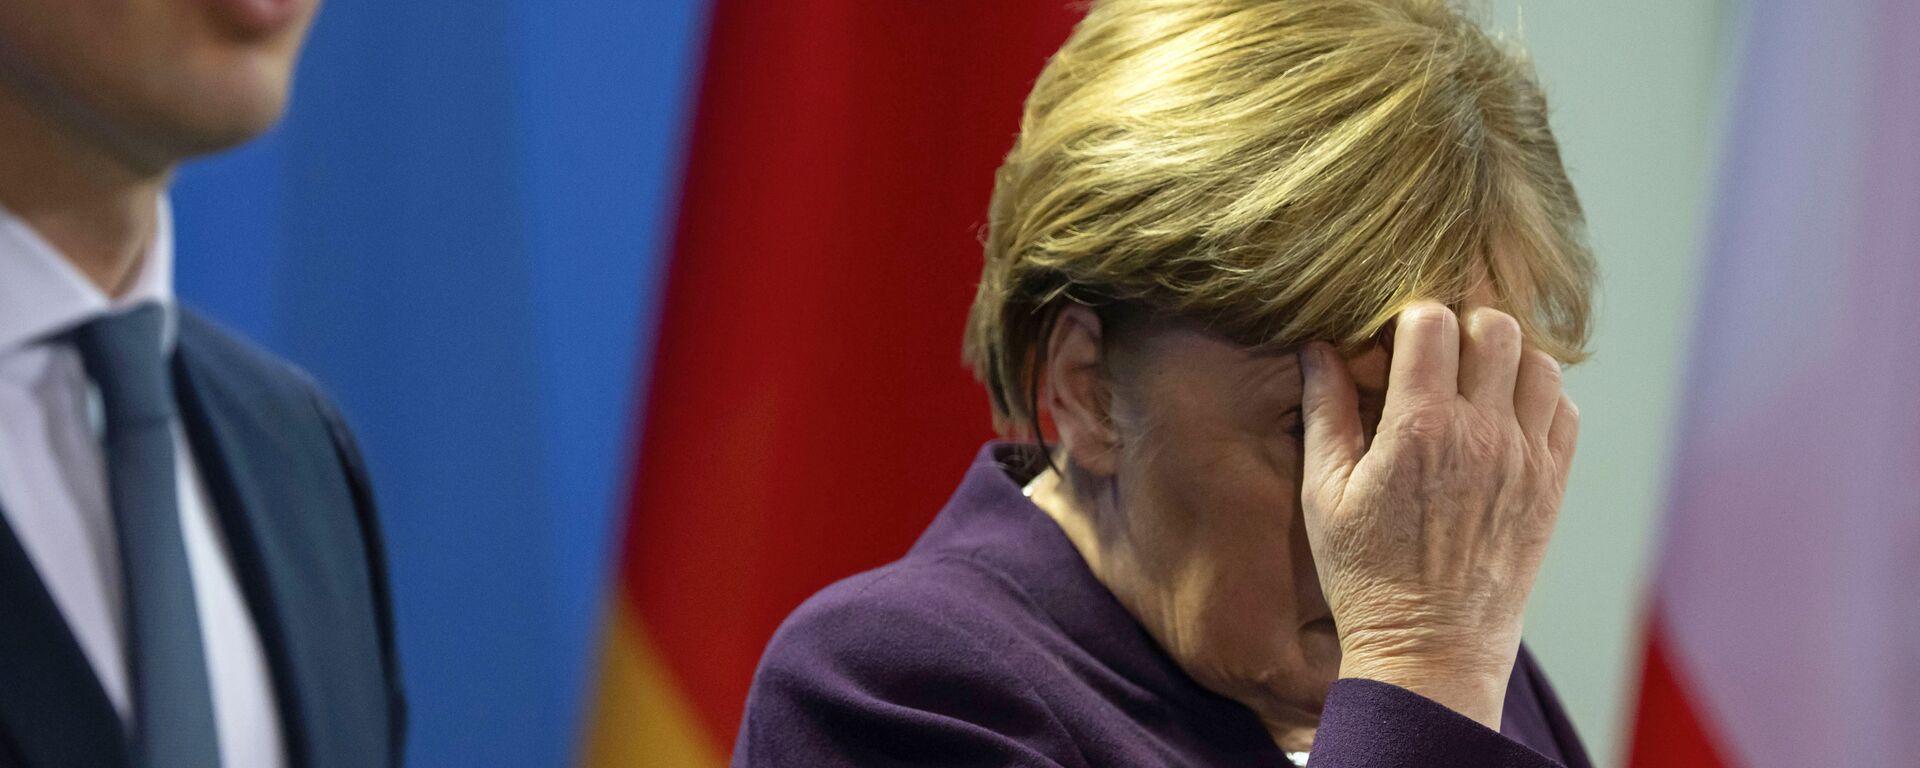 Angela Merkel Sebastijan Kurc - Sputnik Srbija, 1920, 17.09.2021